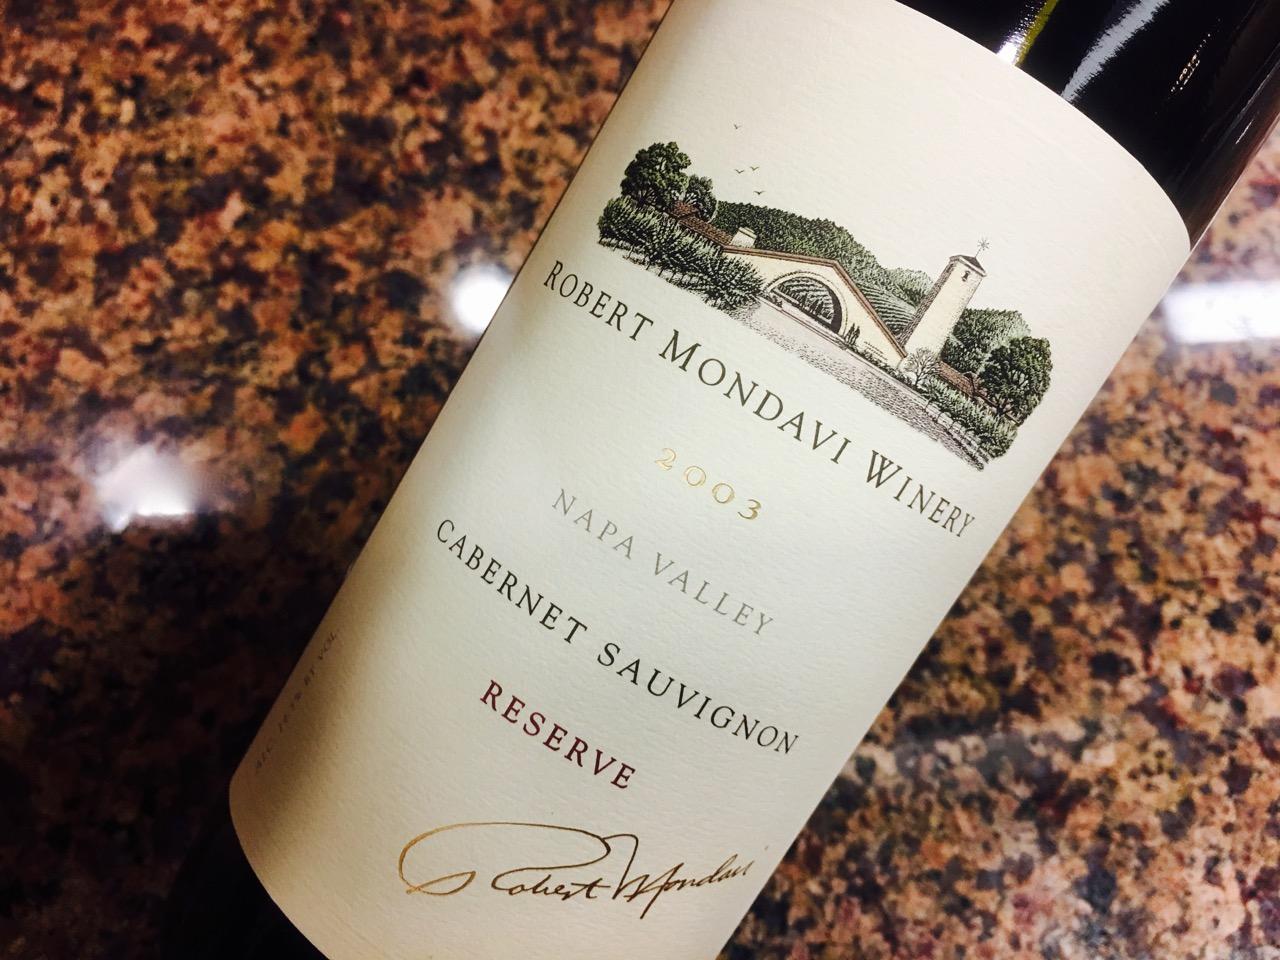 2003 Robert Mondavi Winery Cabernet Sauvignon Reserve Napa Valley